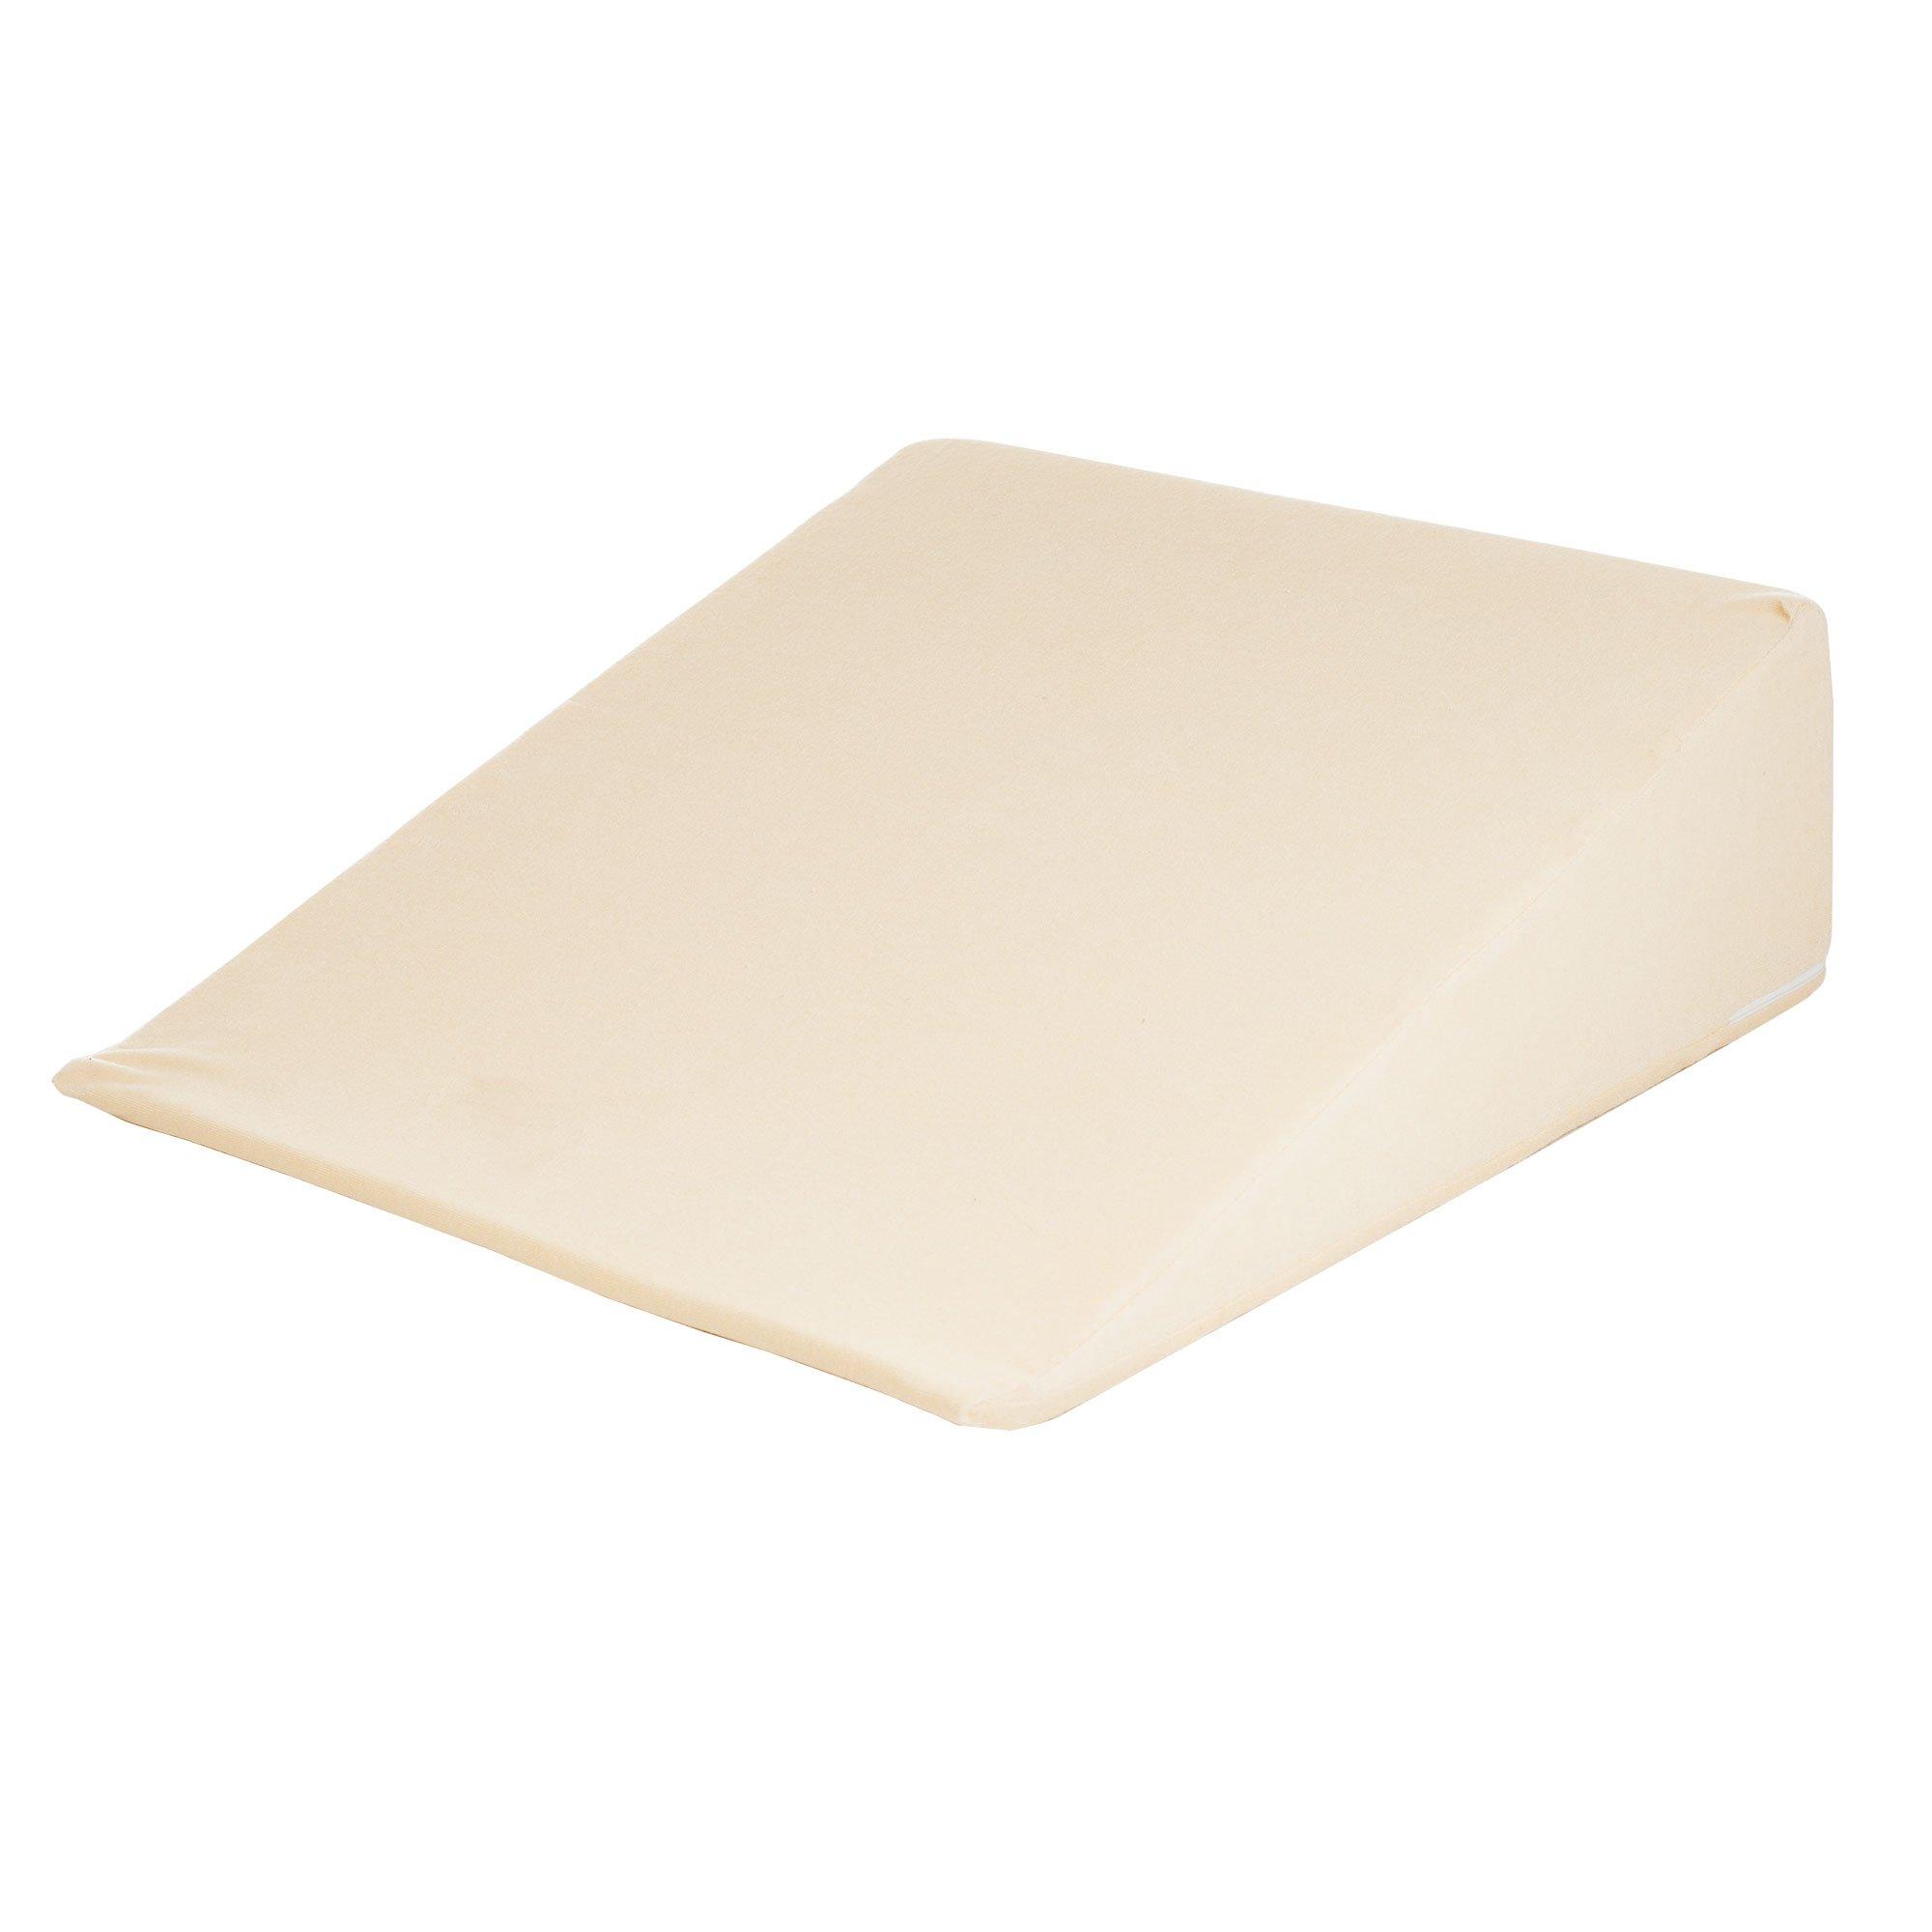 Lavish Home Folding Wedge Memory Foam Pillow - 24'' x 16.2'' x 7''